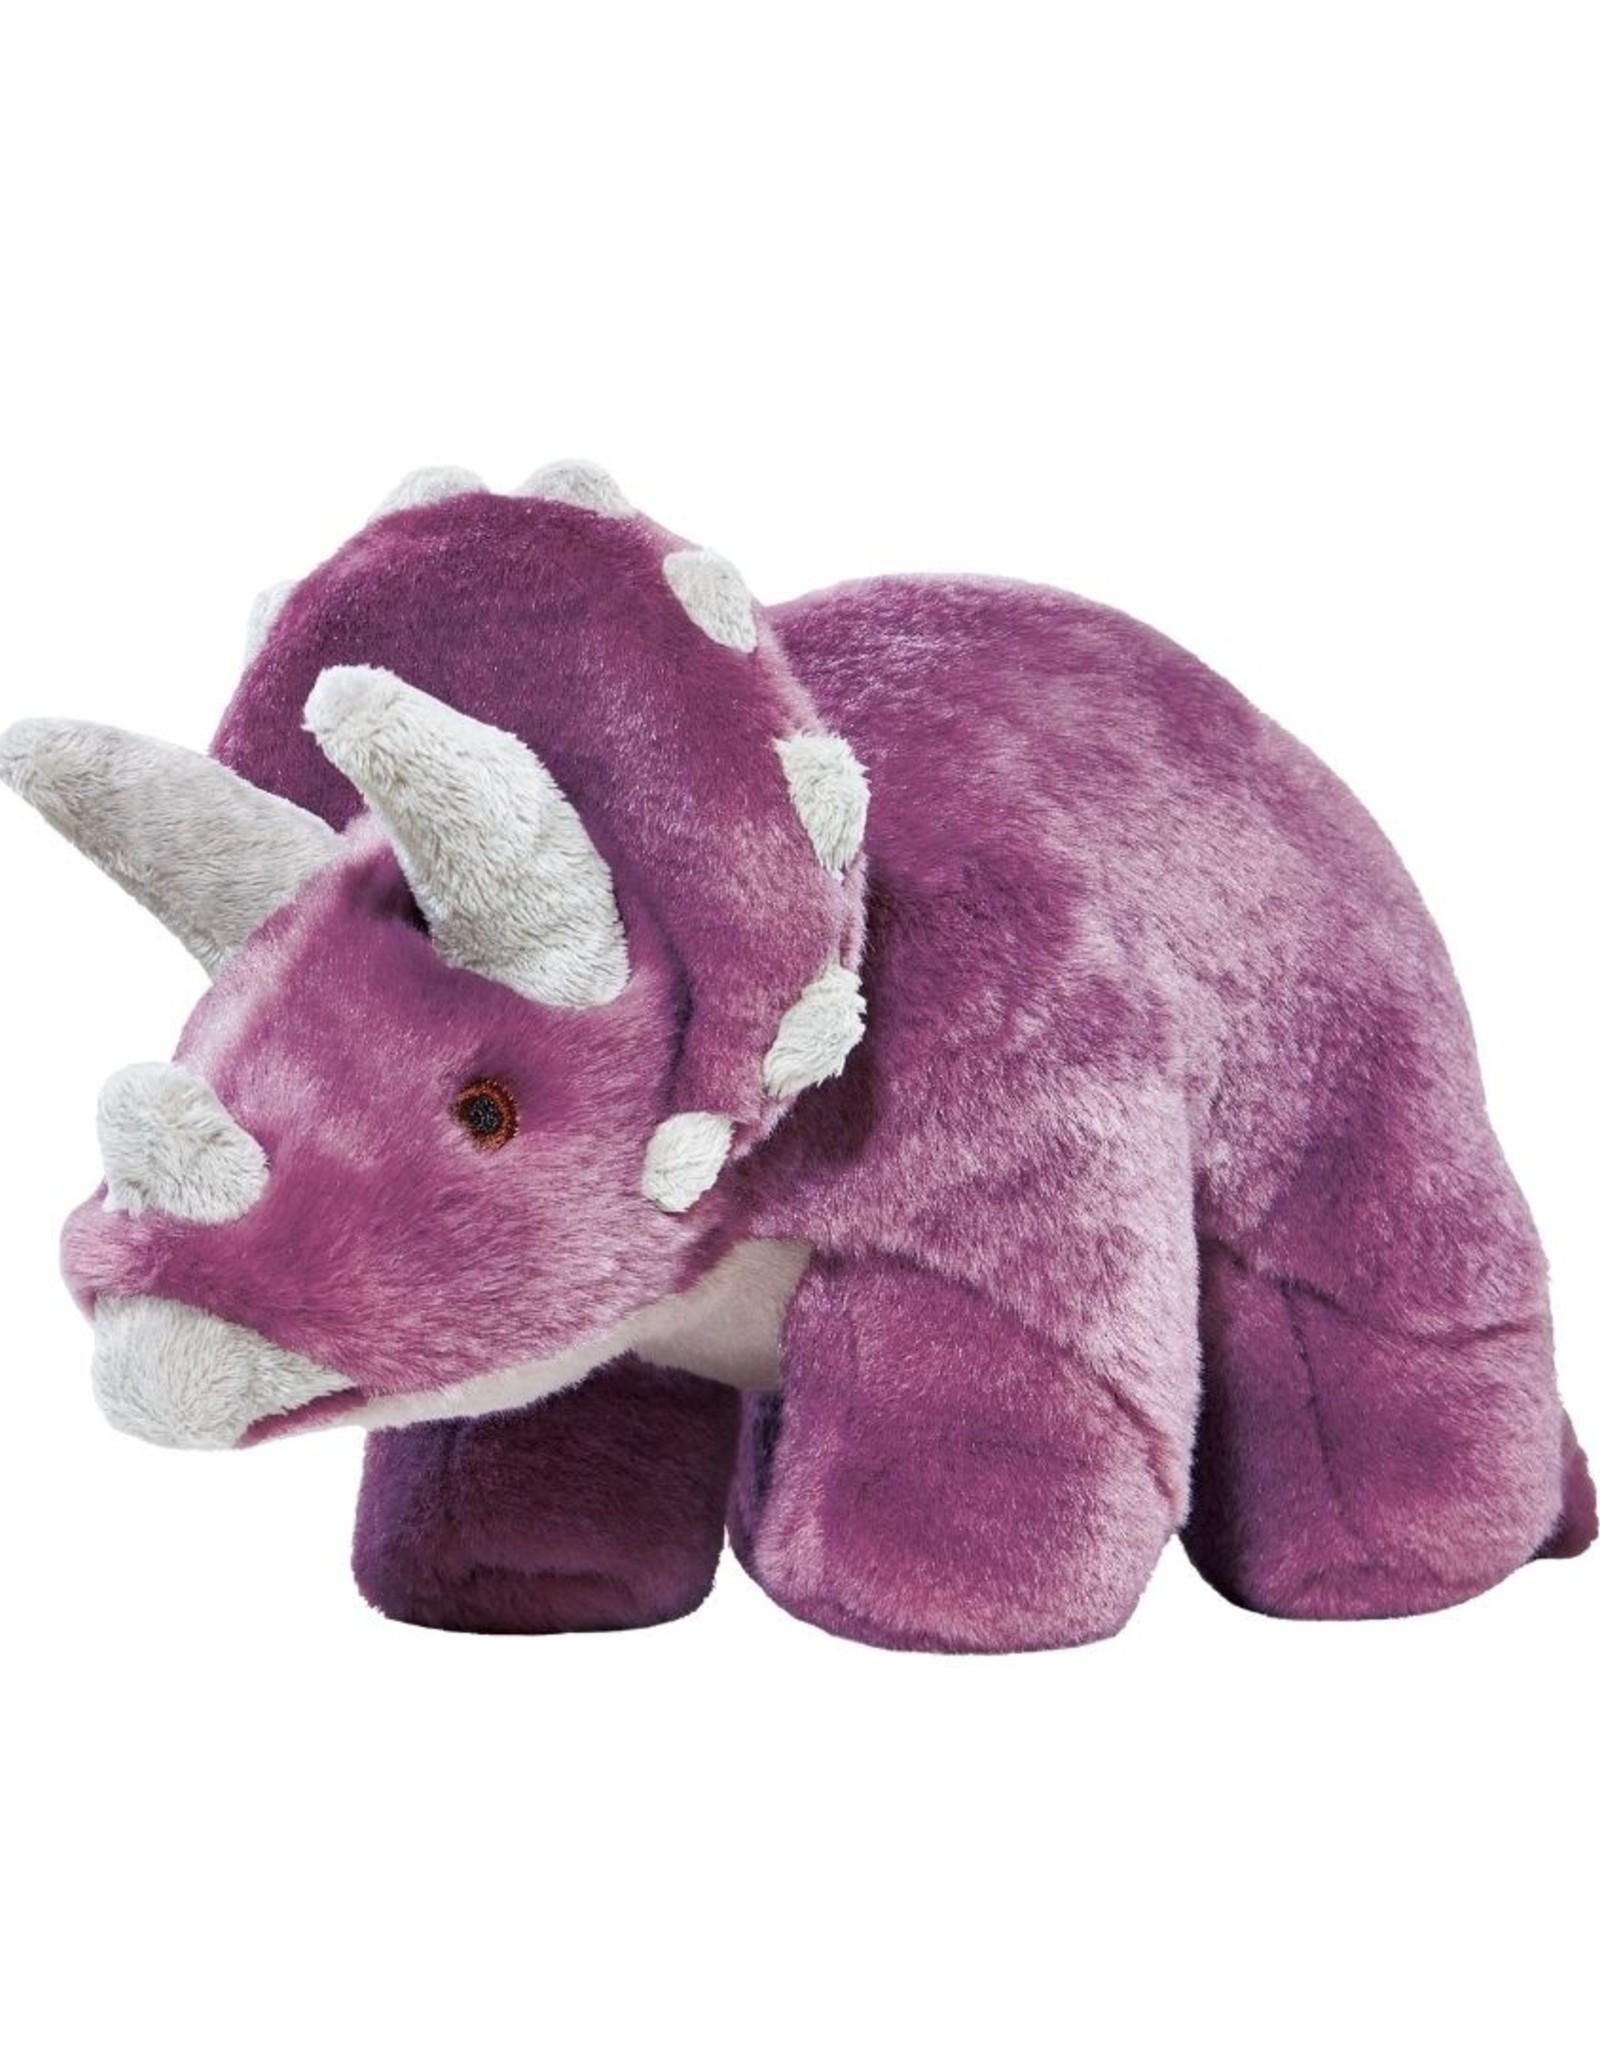 Fluff & Tuff Charlie Triceratops